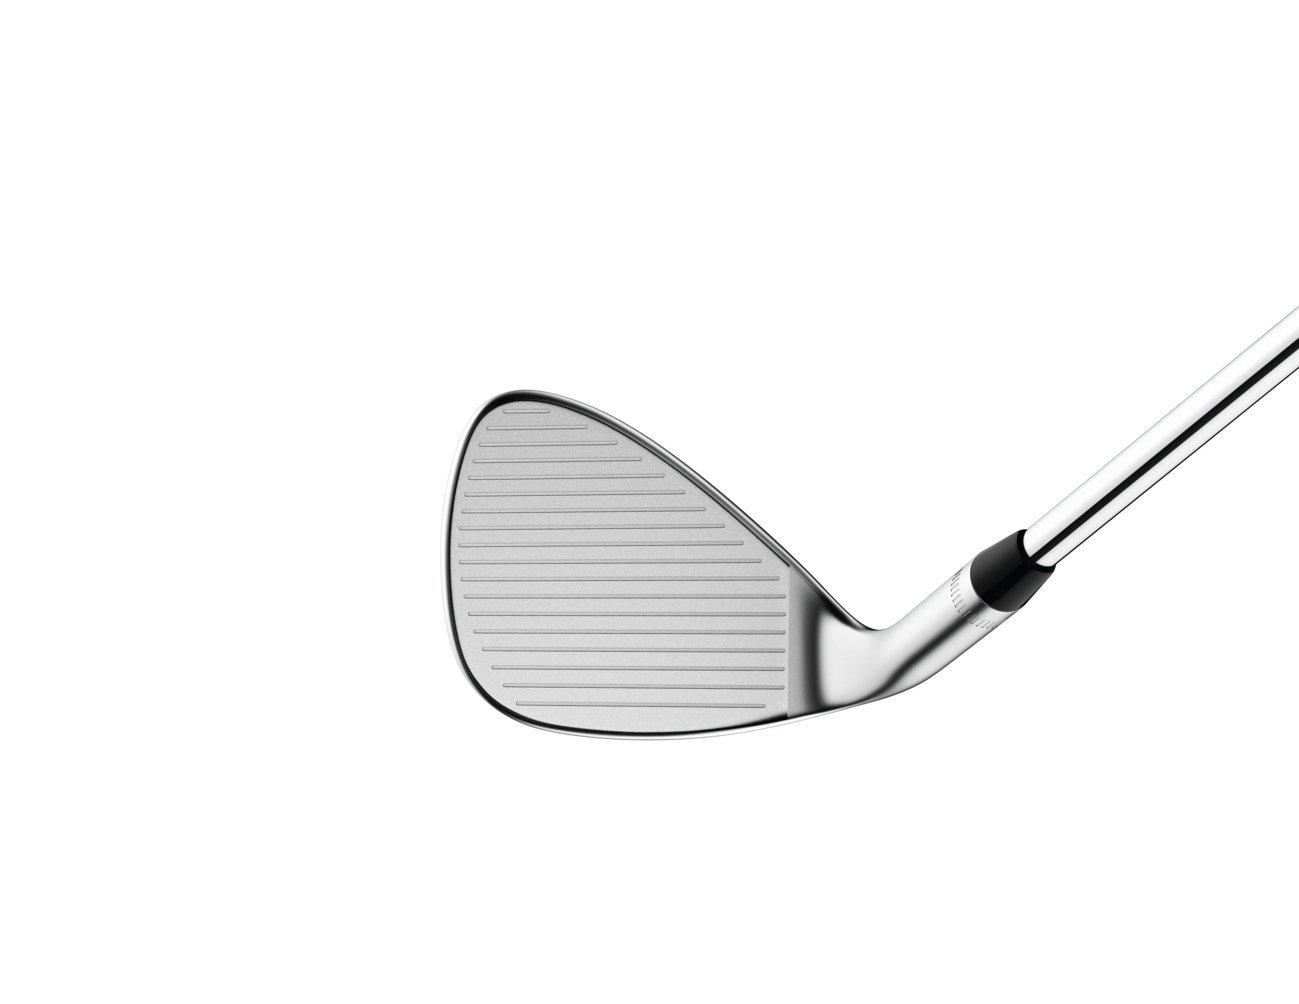 Callaway-Mack-Daddy-PM-Wedge-Phil-Mickelson-Golf-Wedge-U-Grind-Pick-Specs thumbnail 4